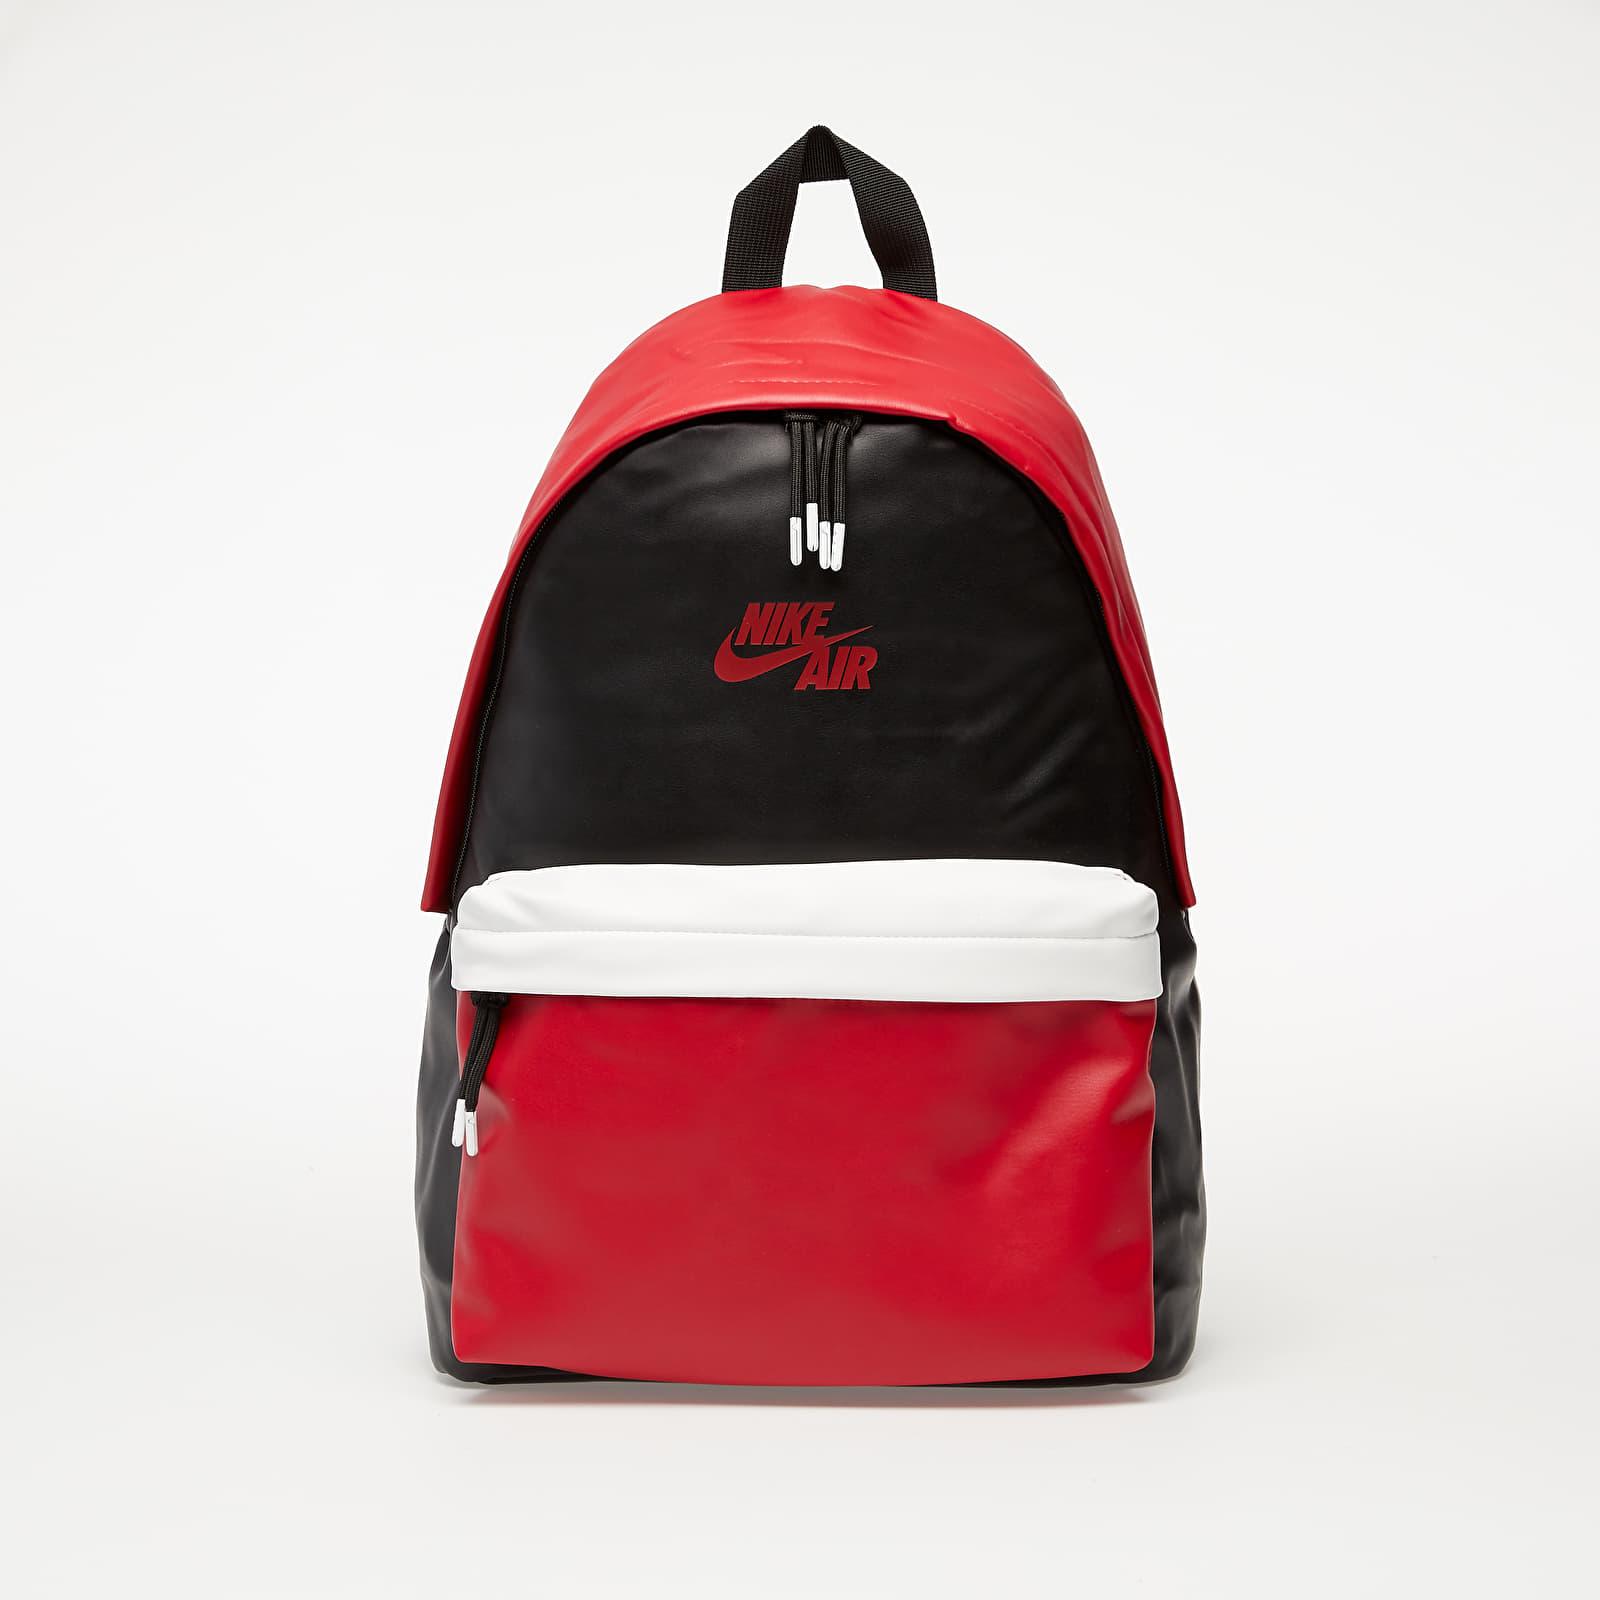 Nike Air 1 Backpack Multicolor 35 litrov